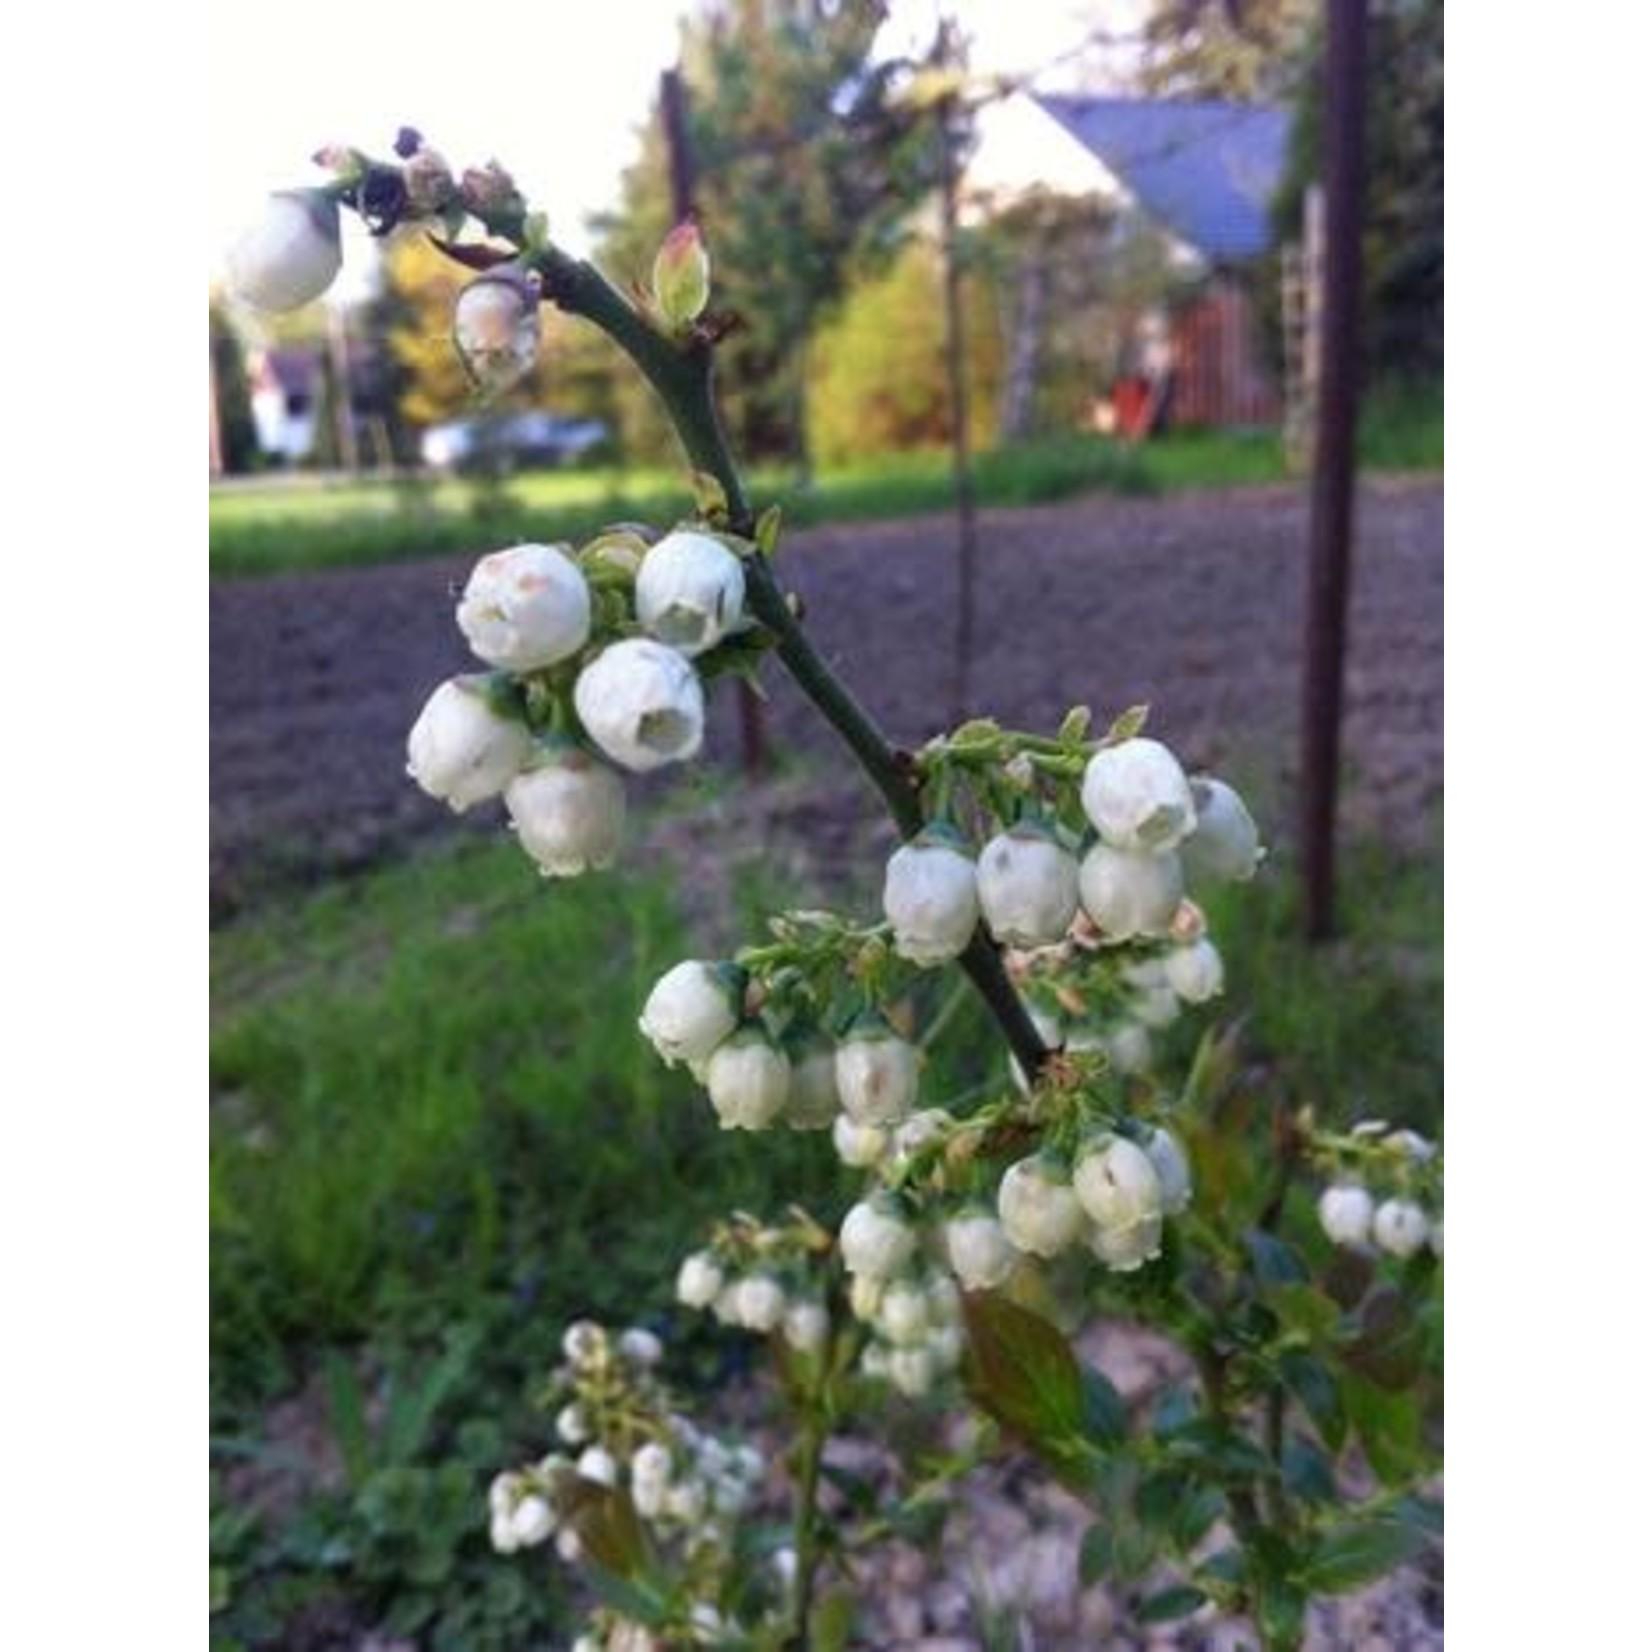 Blueberry - Vaccinium 'Northblue' - 2 gal